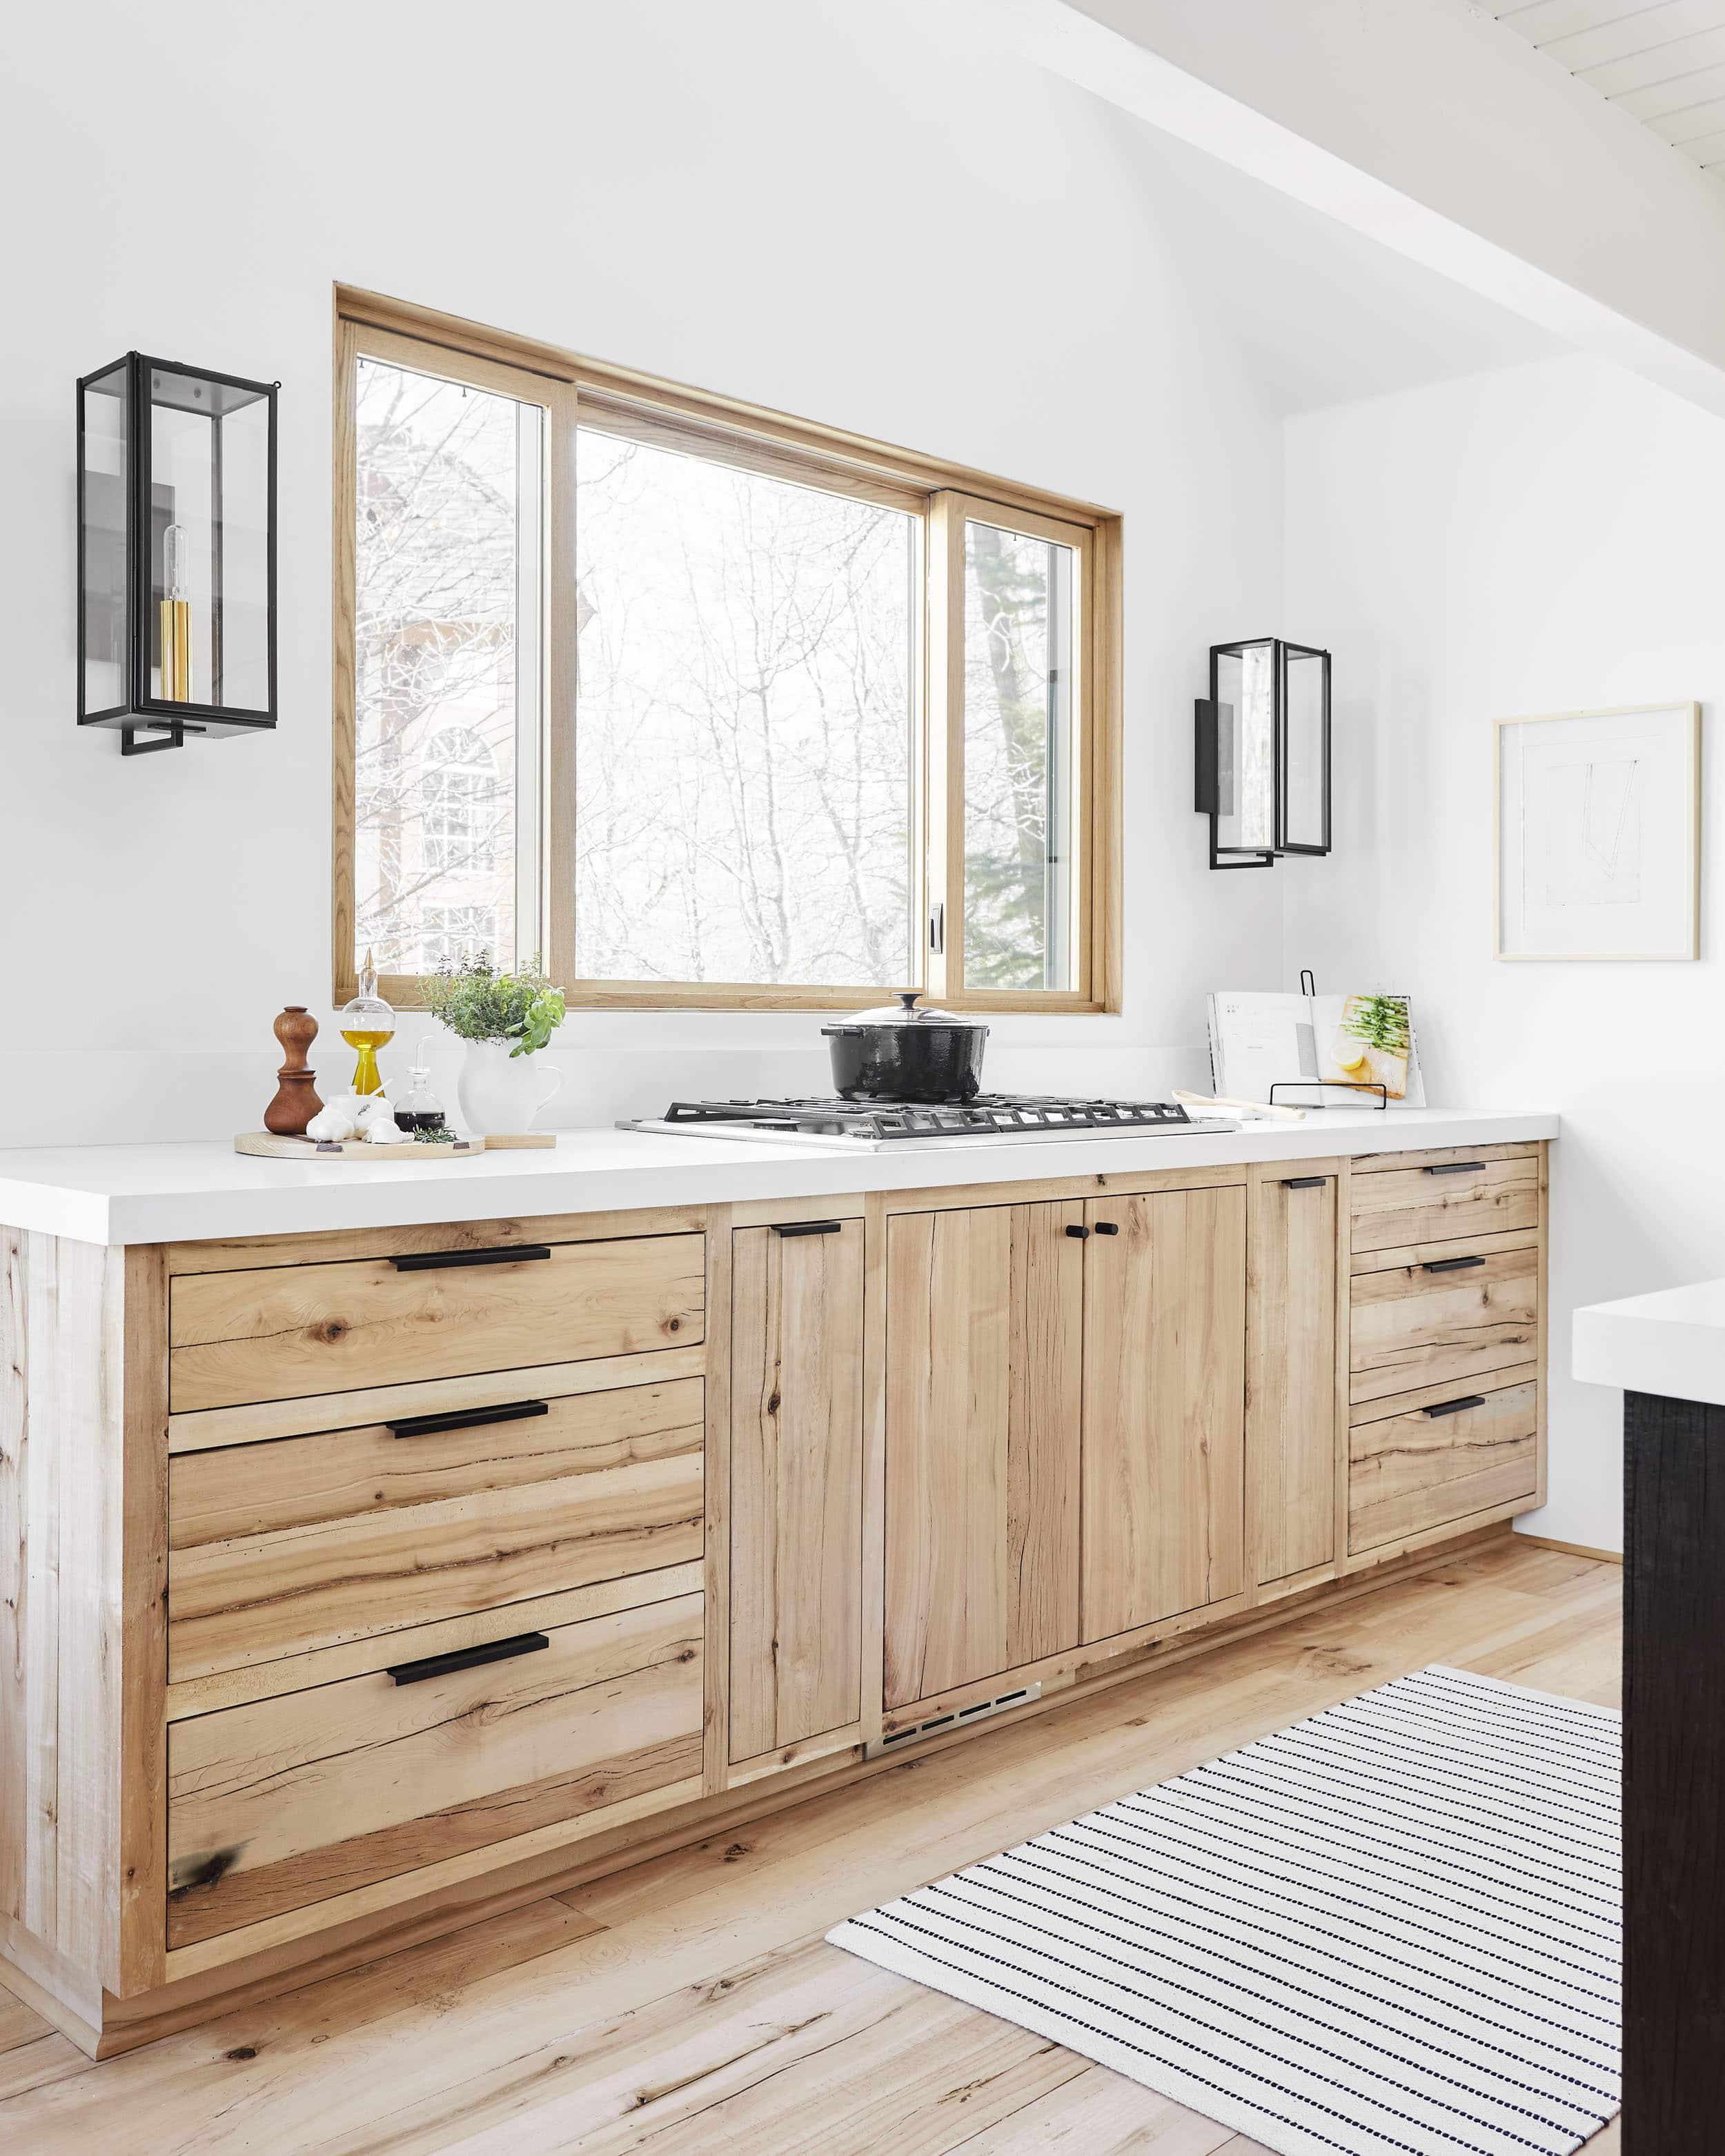 Emily Henderson Mountain House Scandinavian kitchen remodel_23